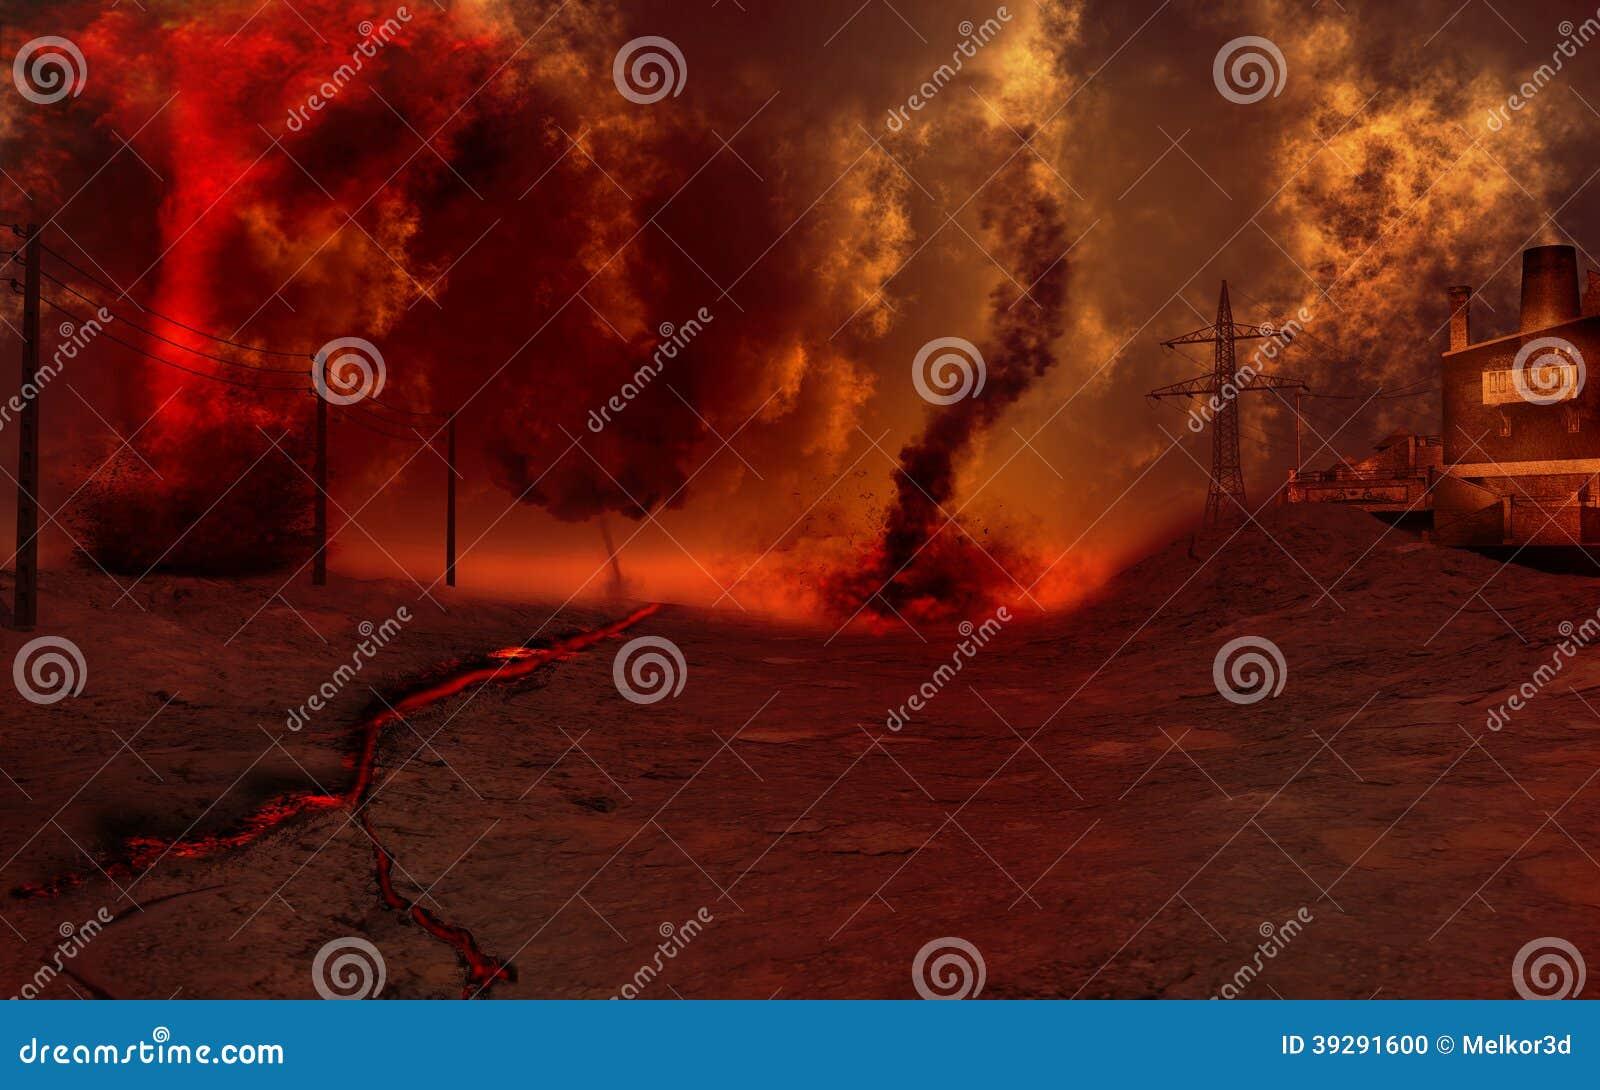 Red Storm Stock Illustration - Image: 39291600